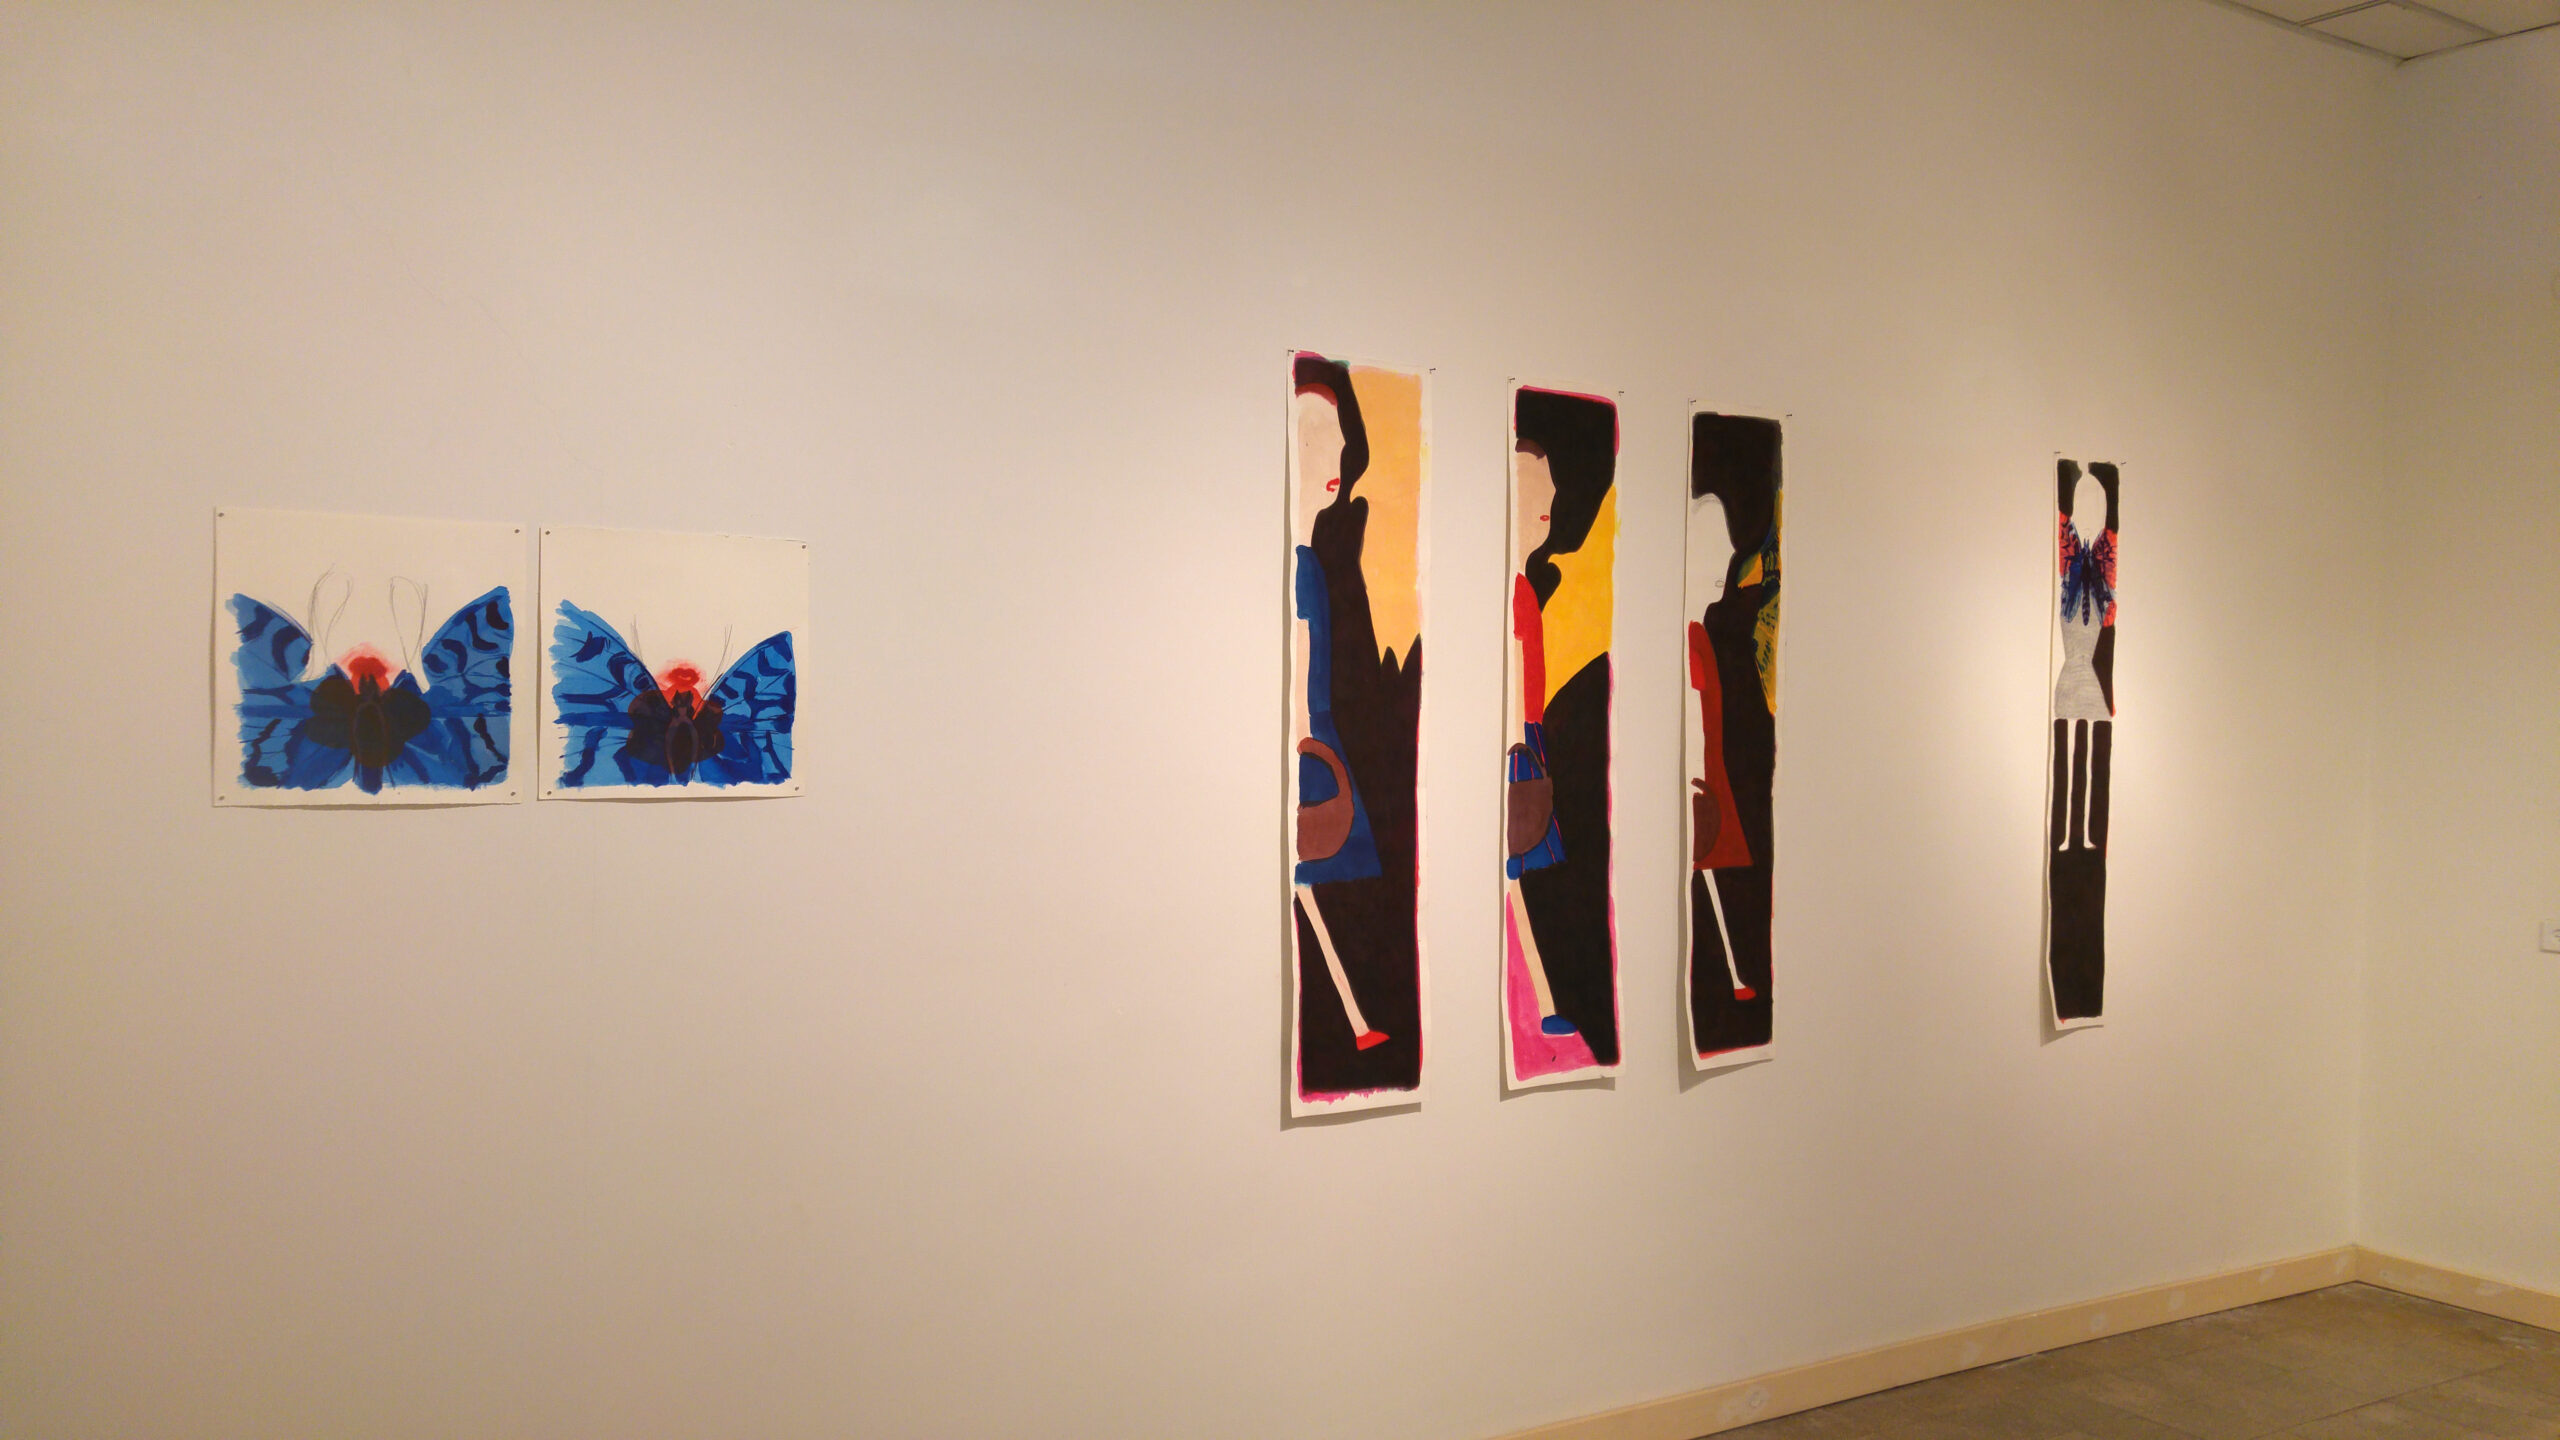 exhibition view givat haim, 2017